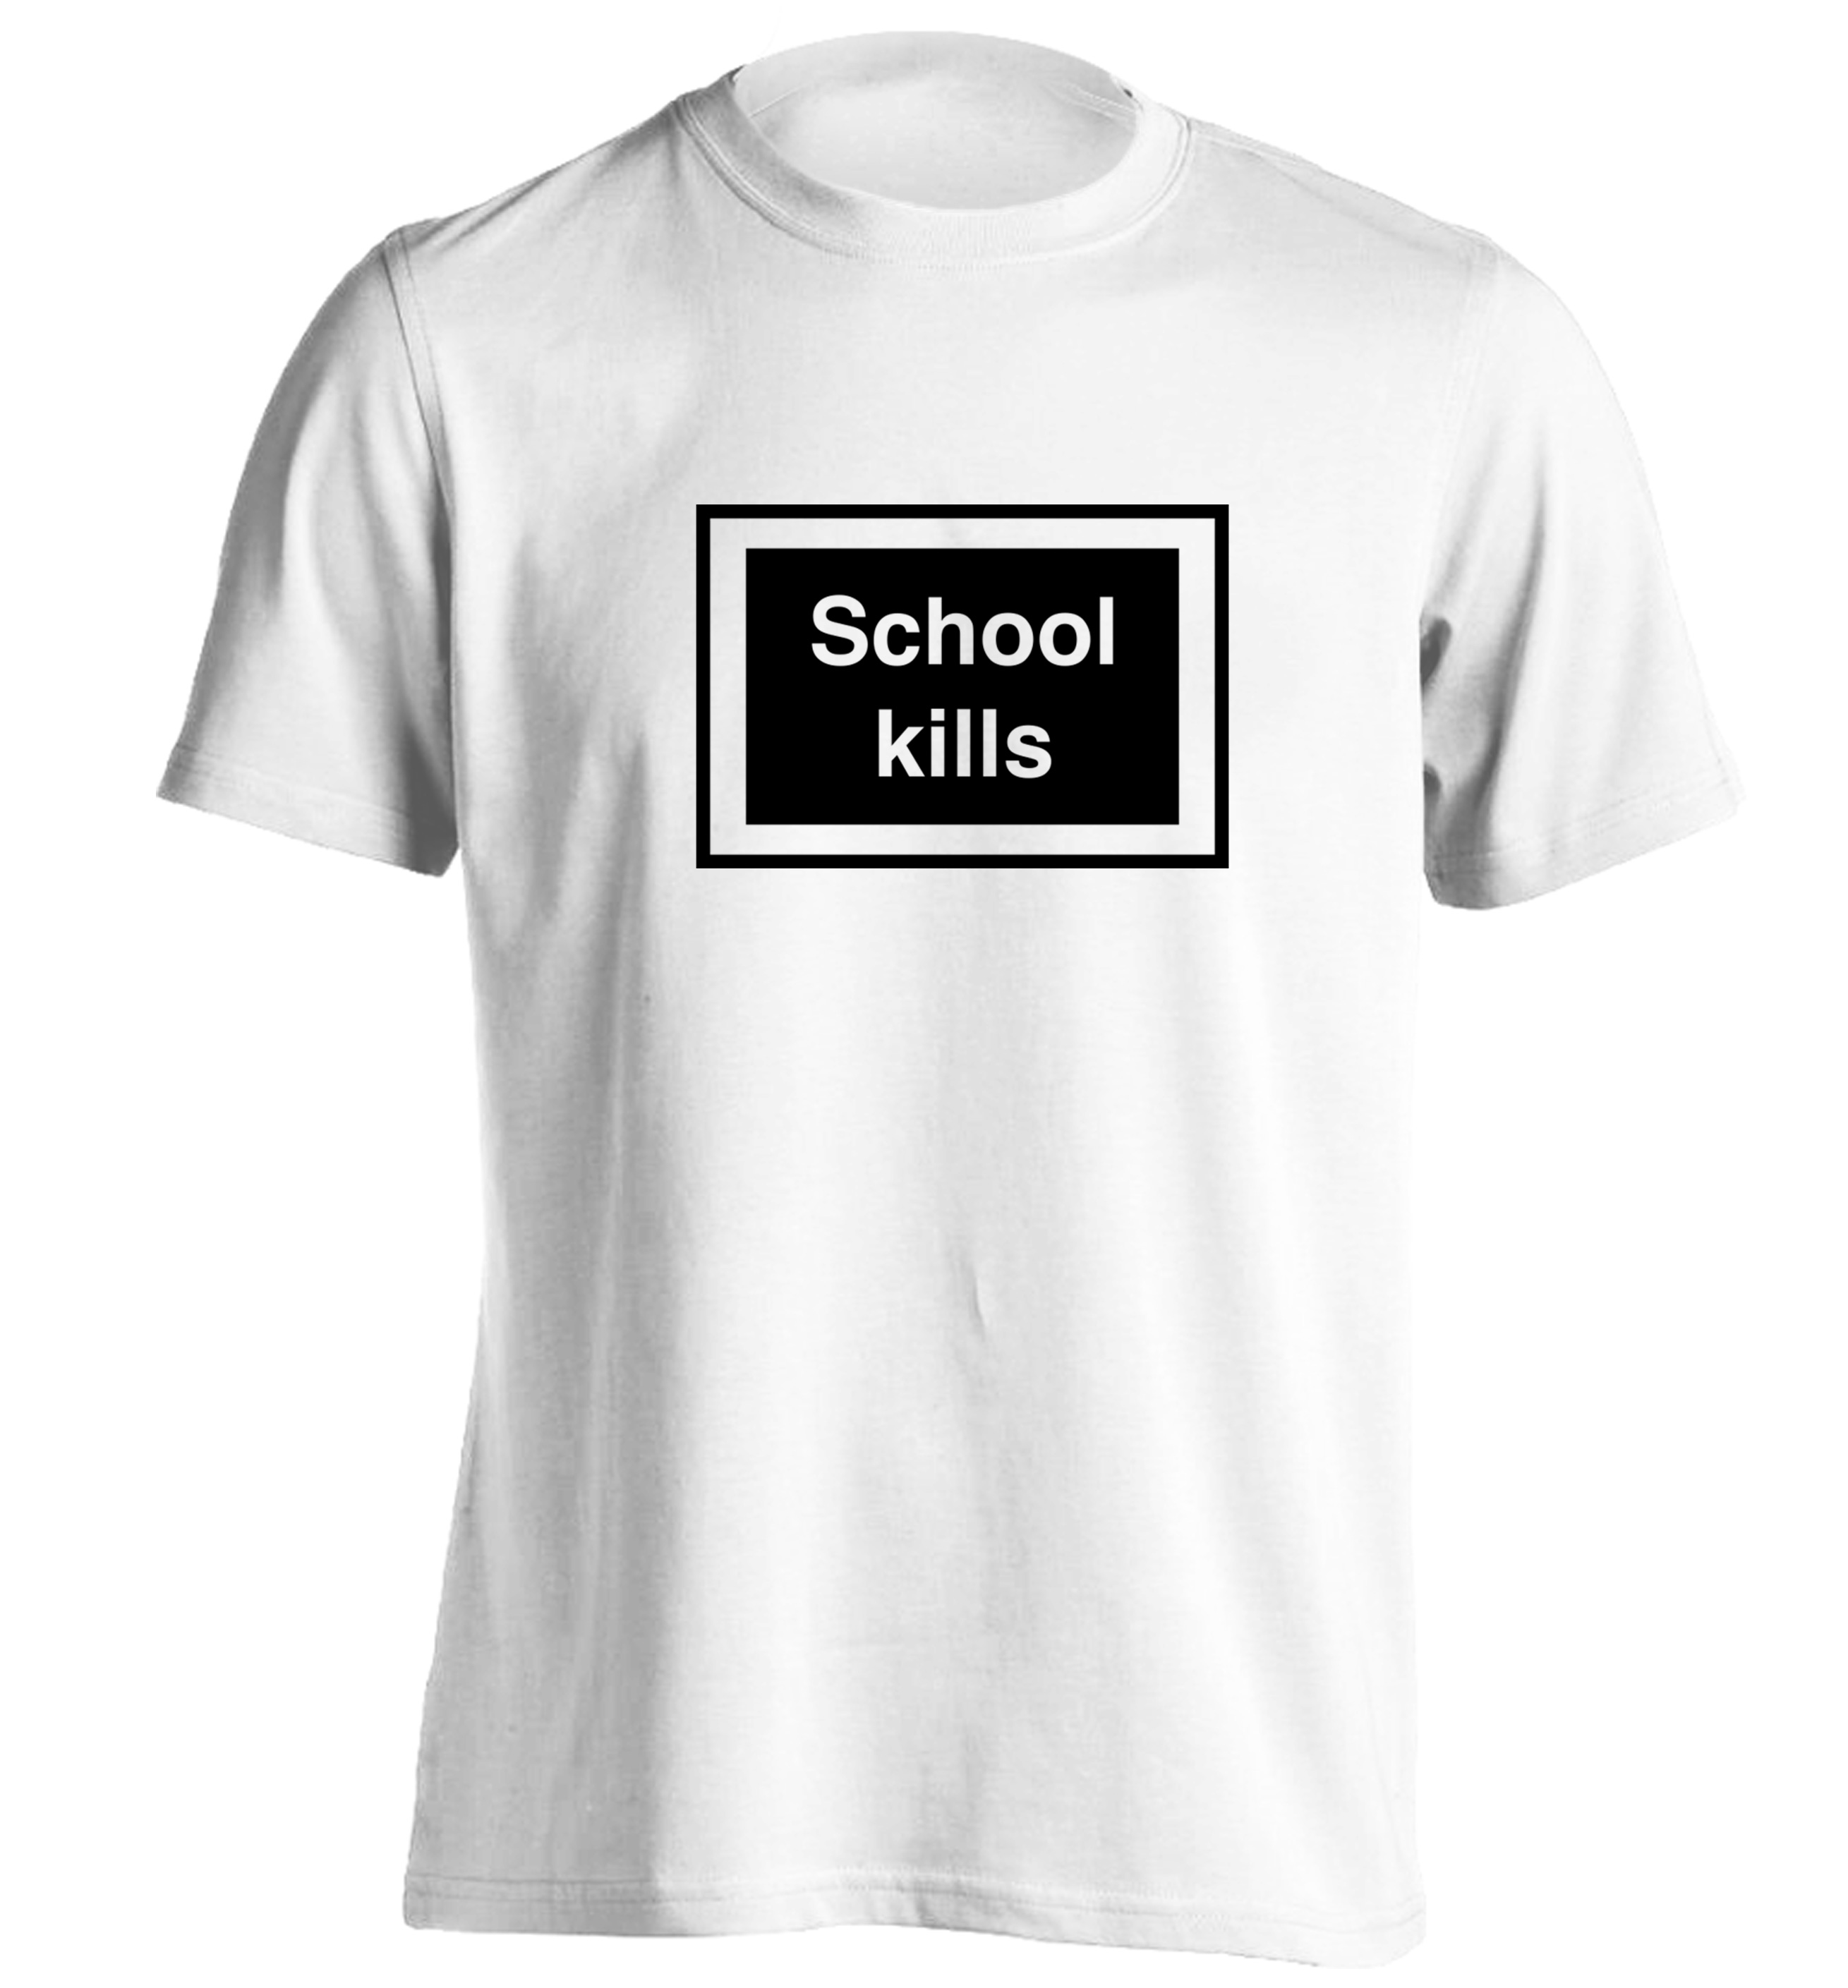 Black t shirt grunge - School Kills Tshirt Funny Joke Hipster Tumblr Instagram Grunge Text Slogan Black Gift T Shirt S